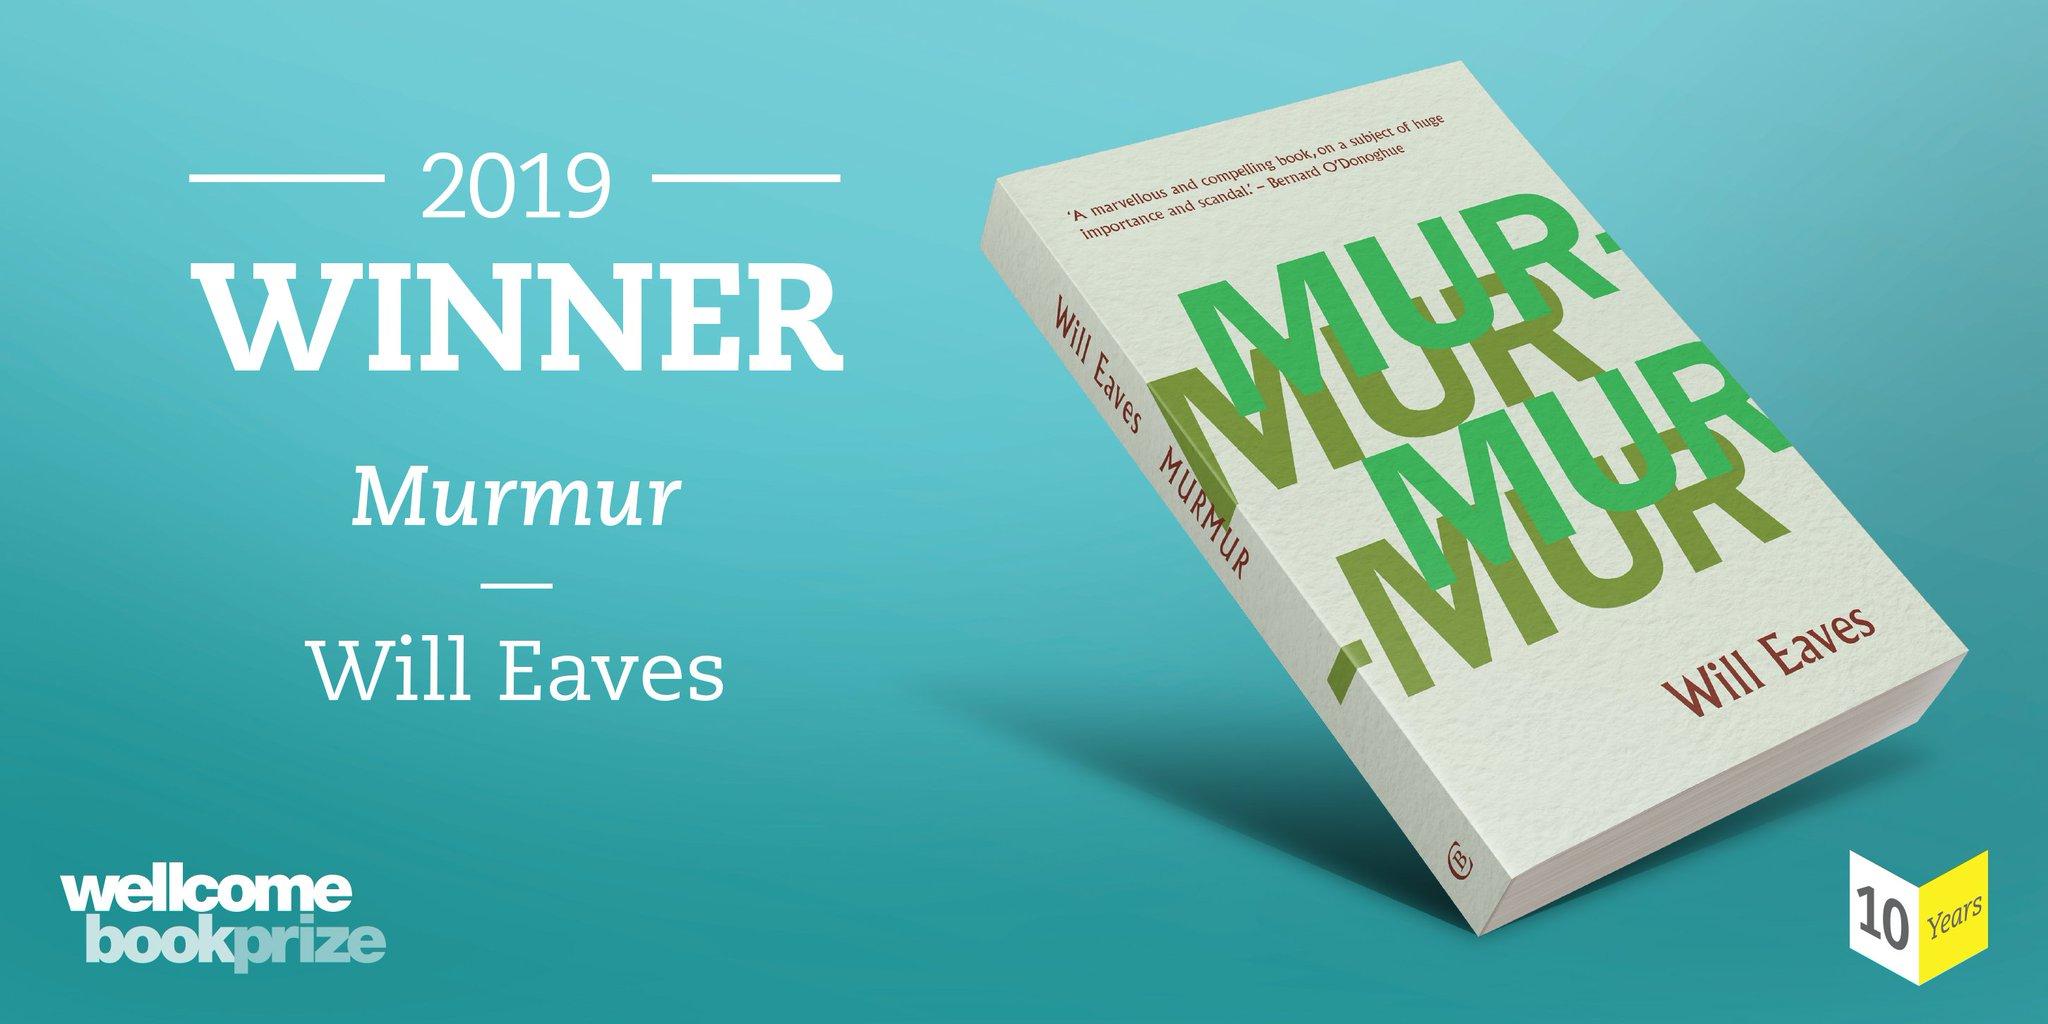 ellcome book prize rewarding - HD2048×1024